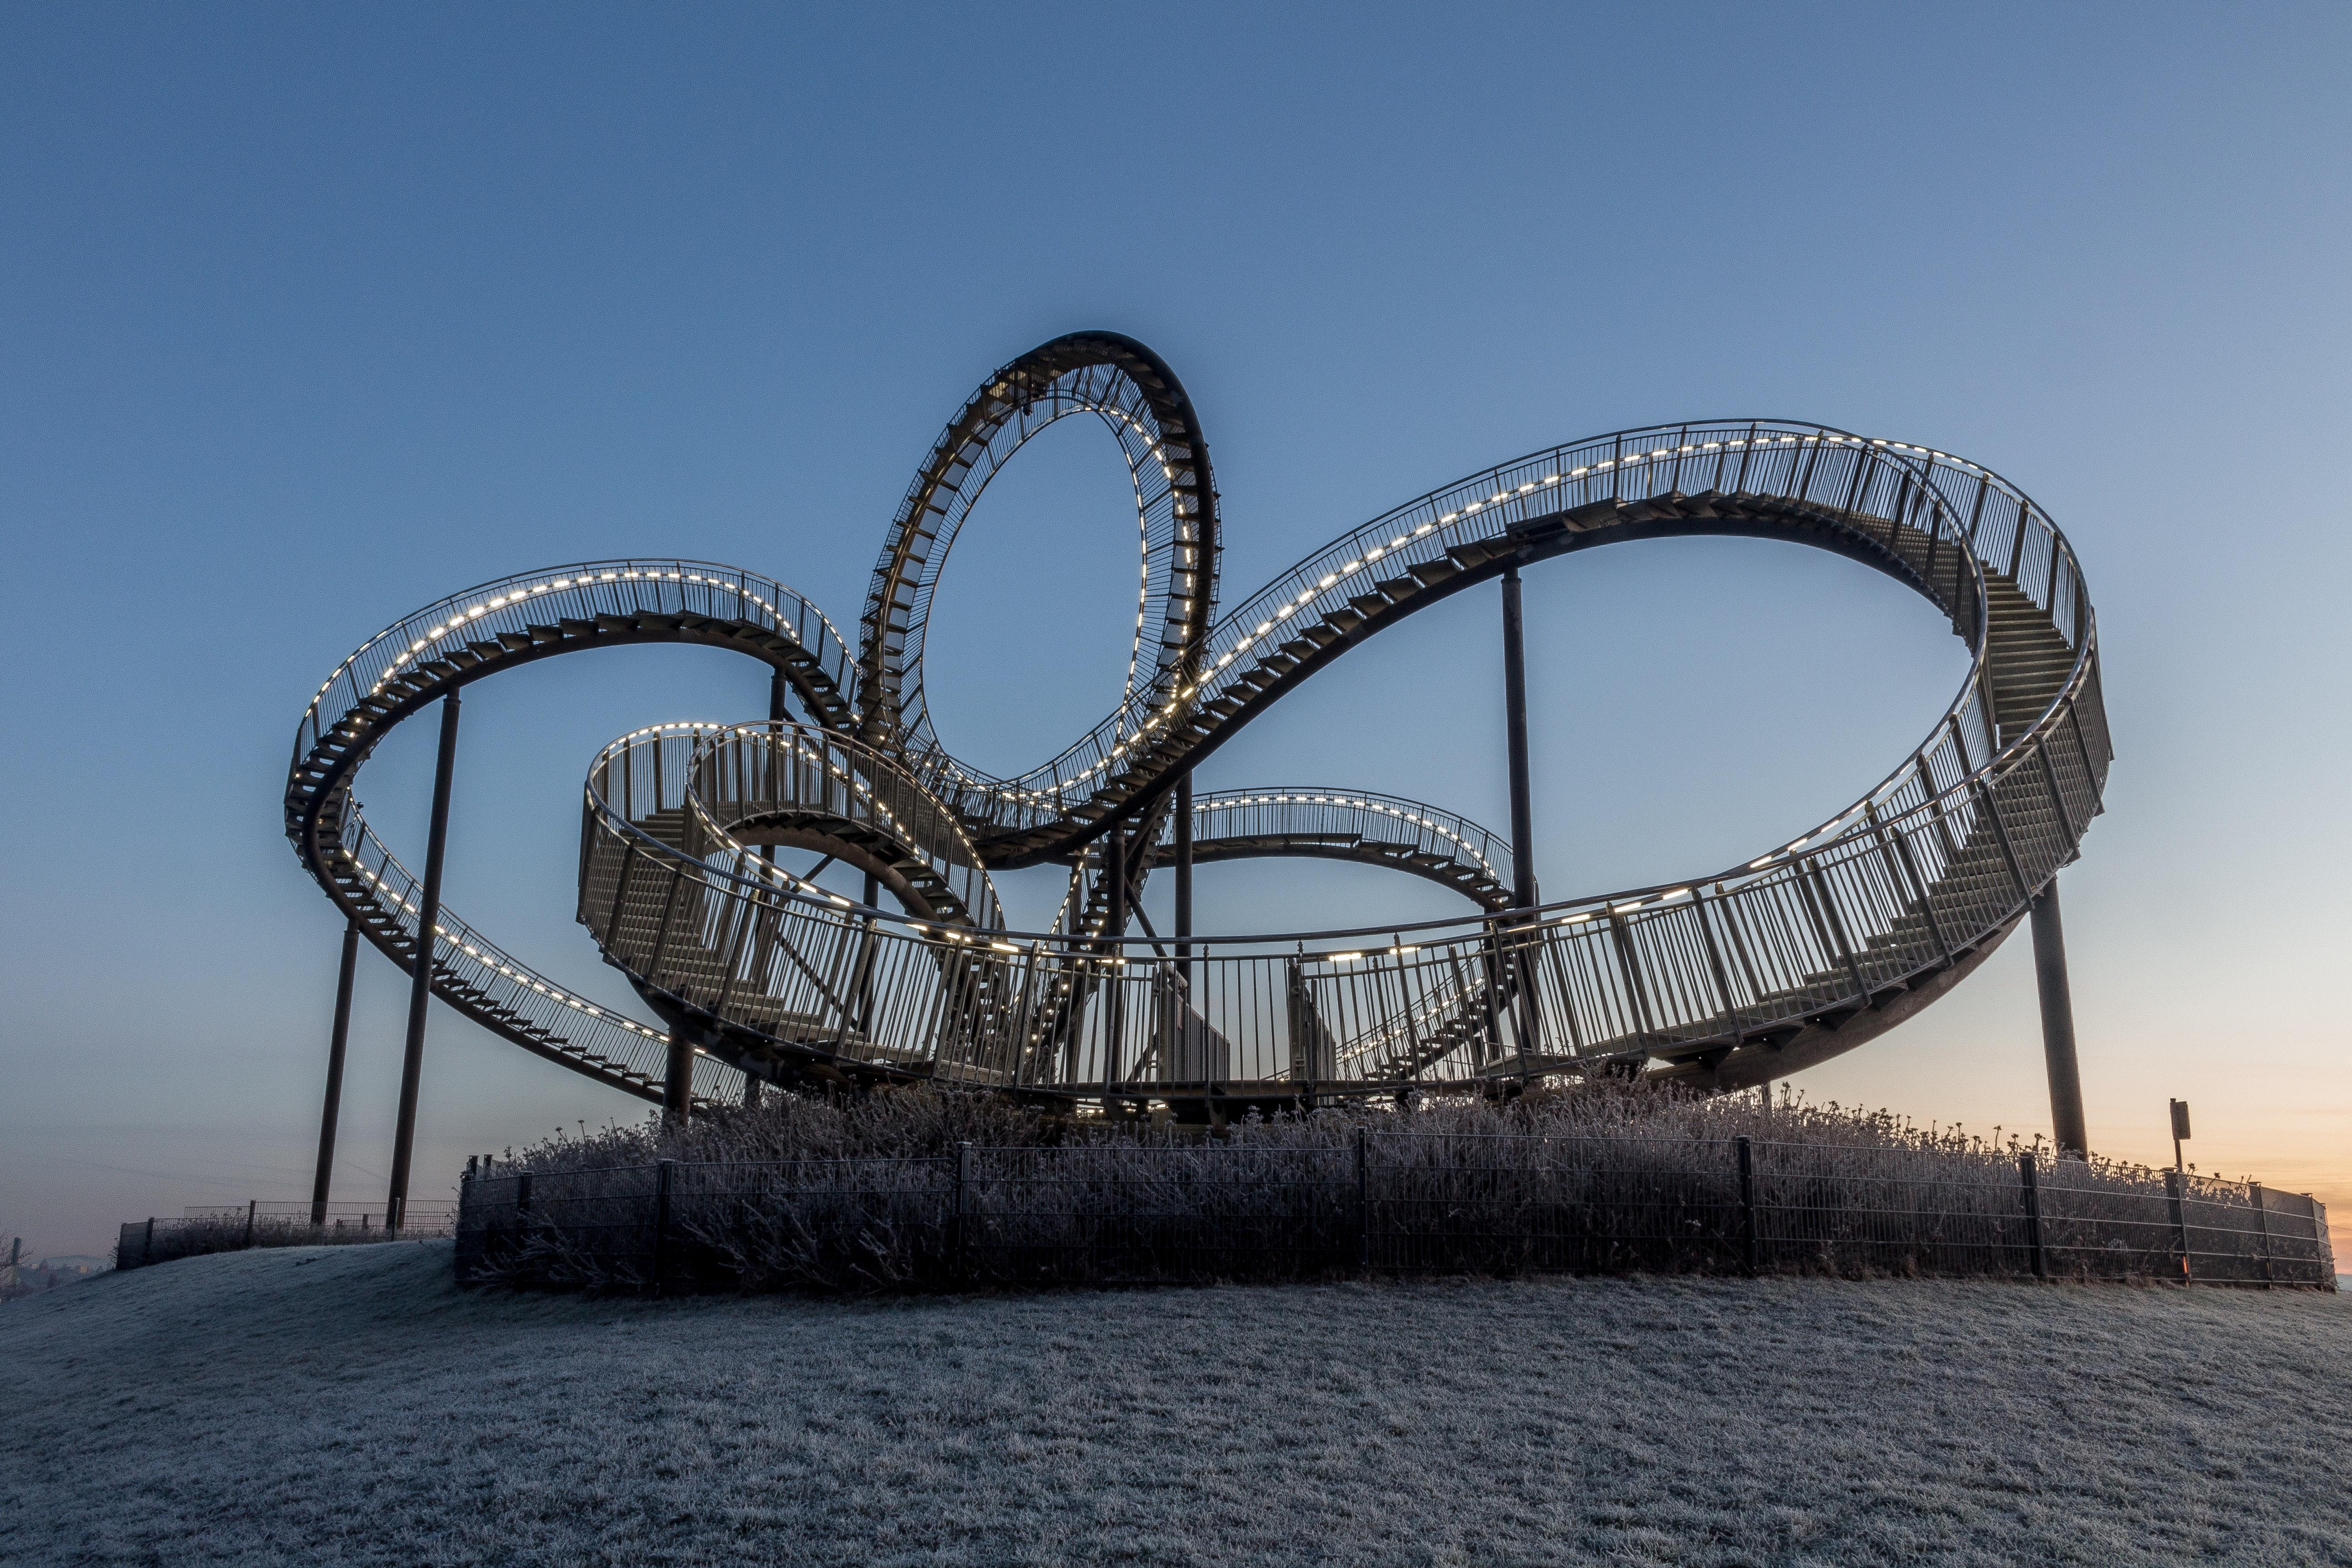 Ferris wheel in city photo